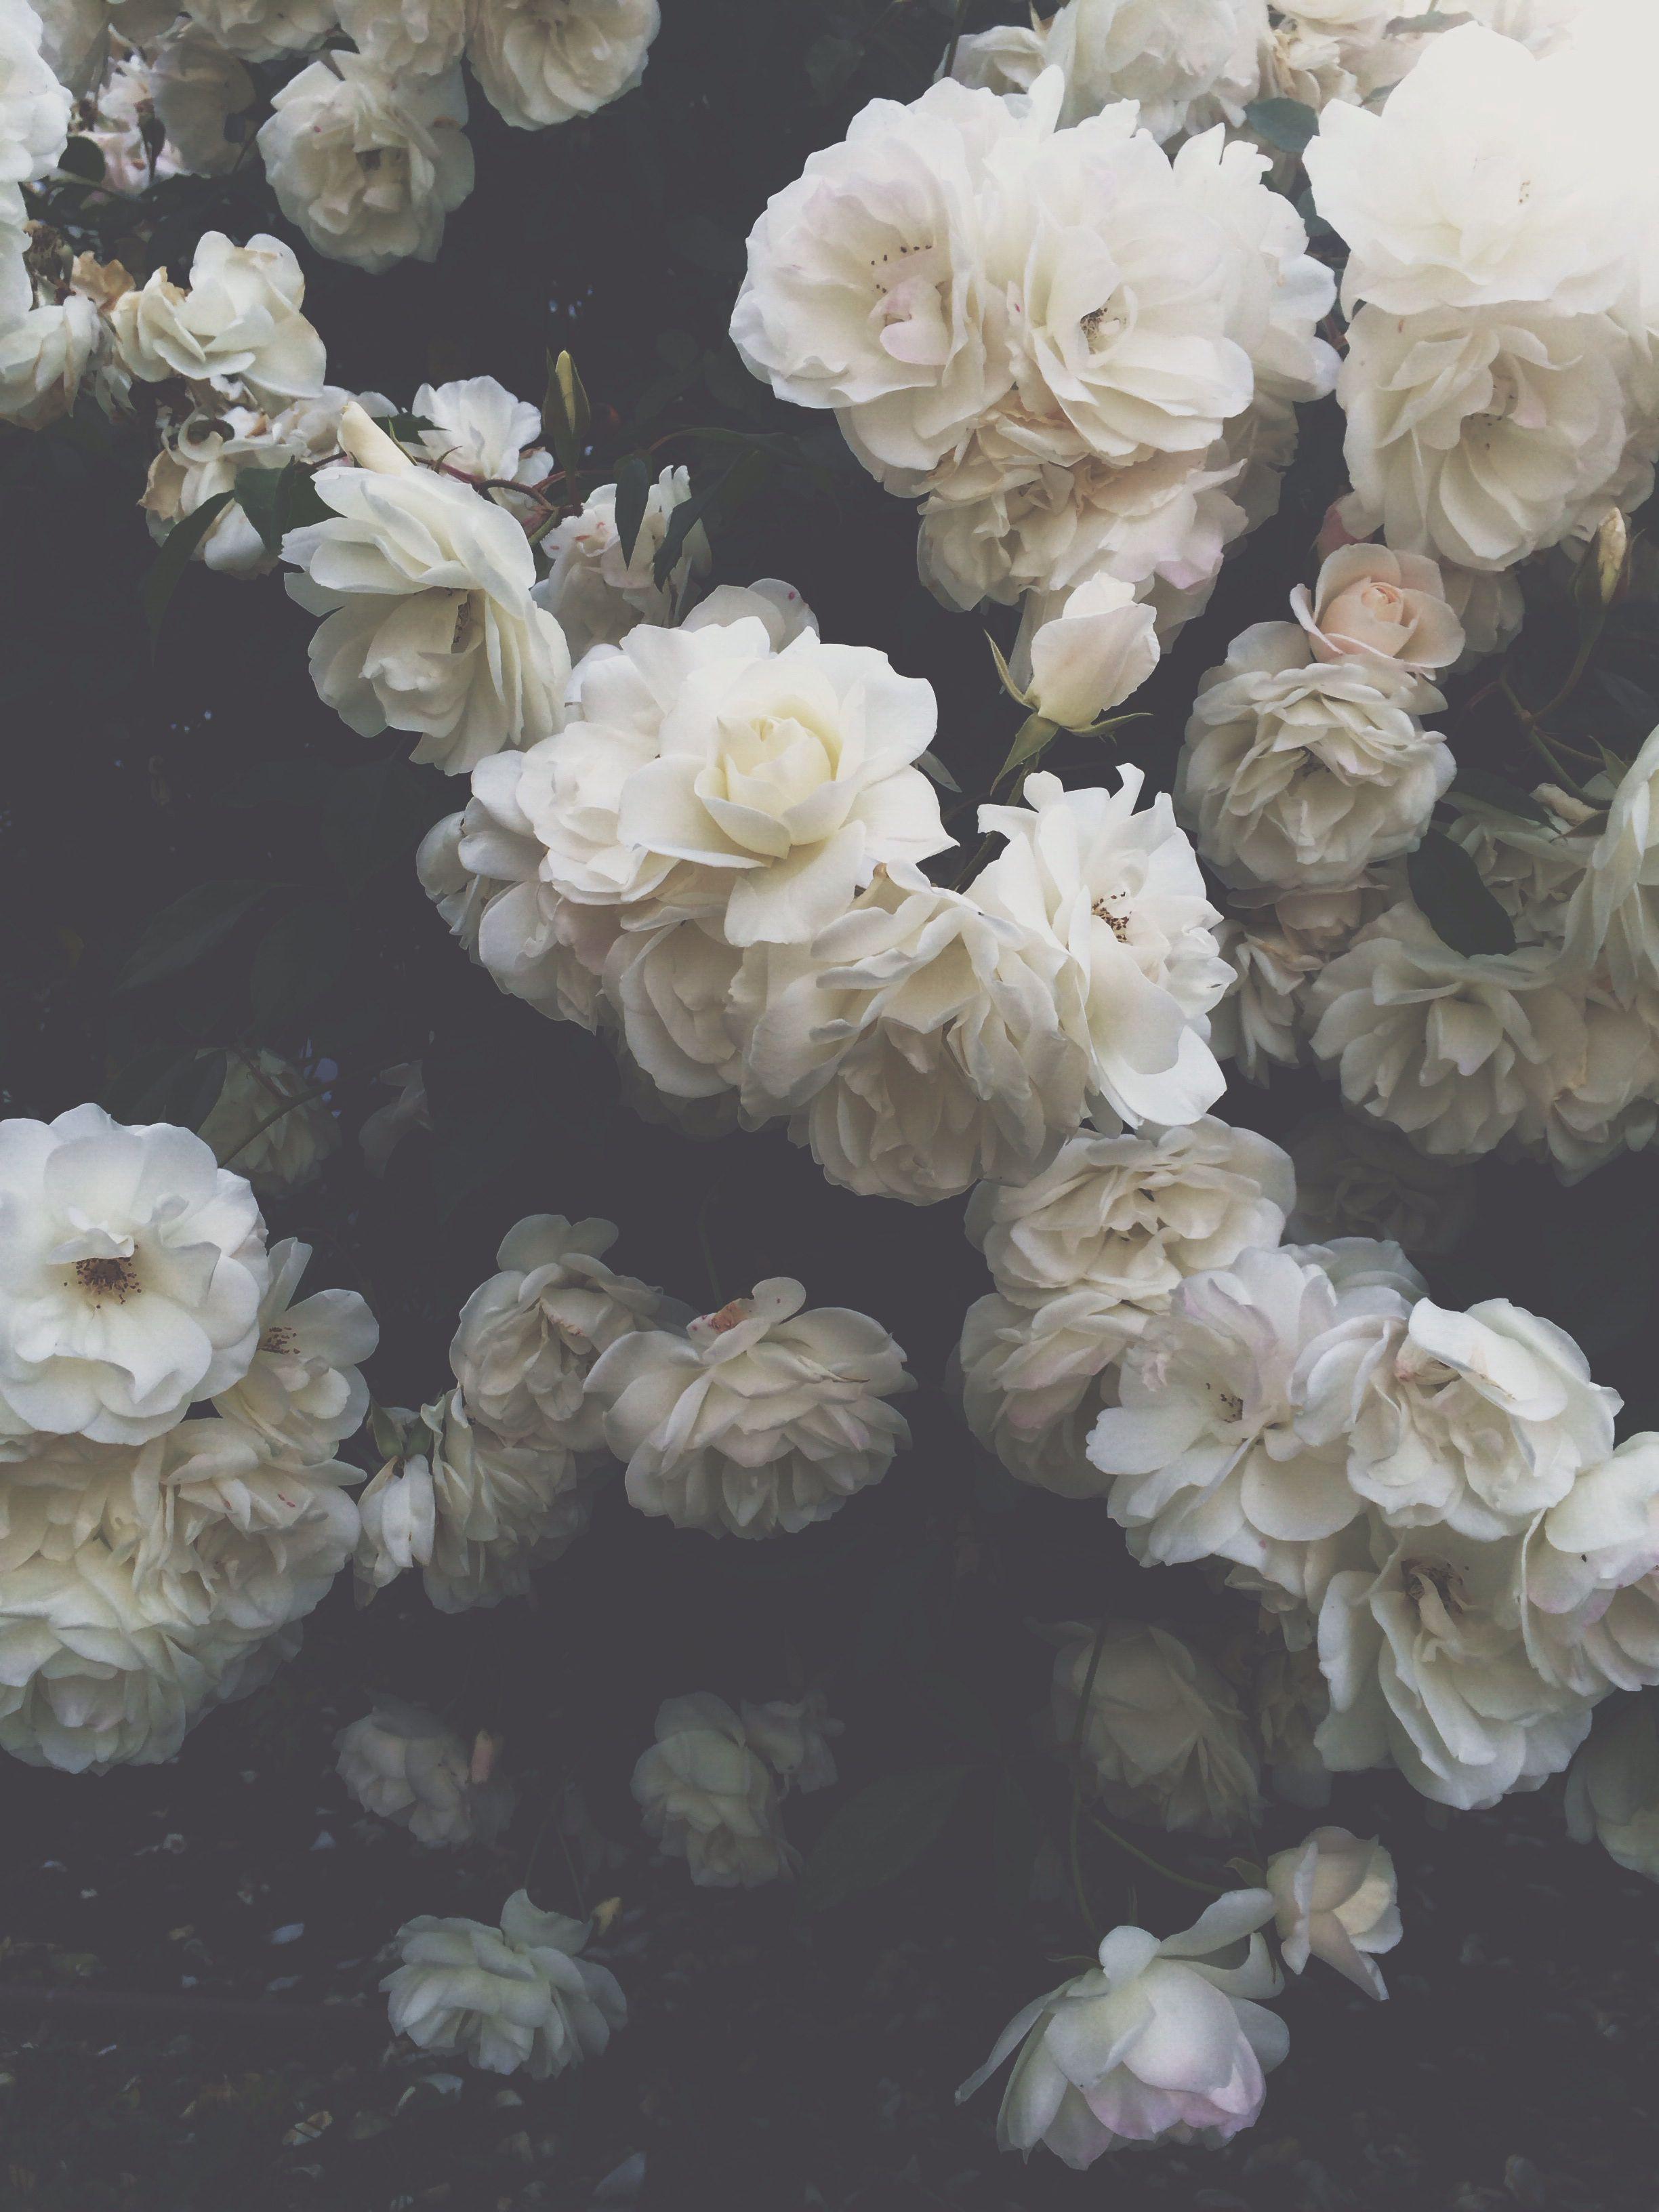 White Flower Aesthetic Wallpapers - Wallpaper Cave